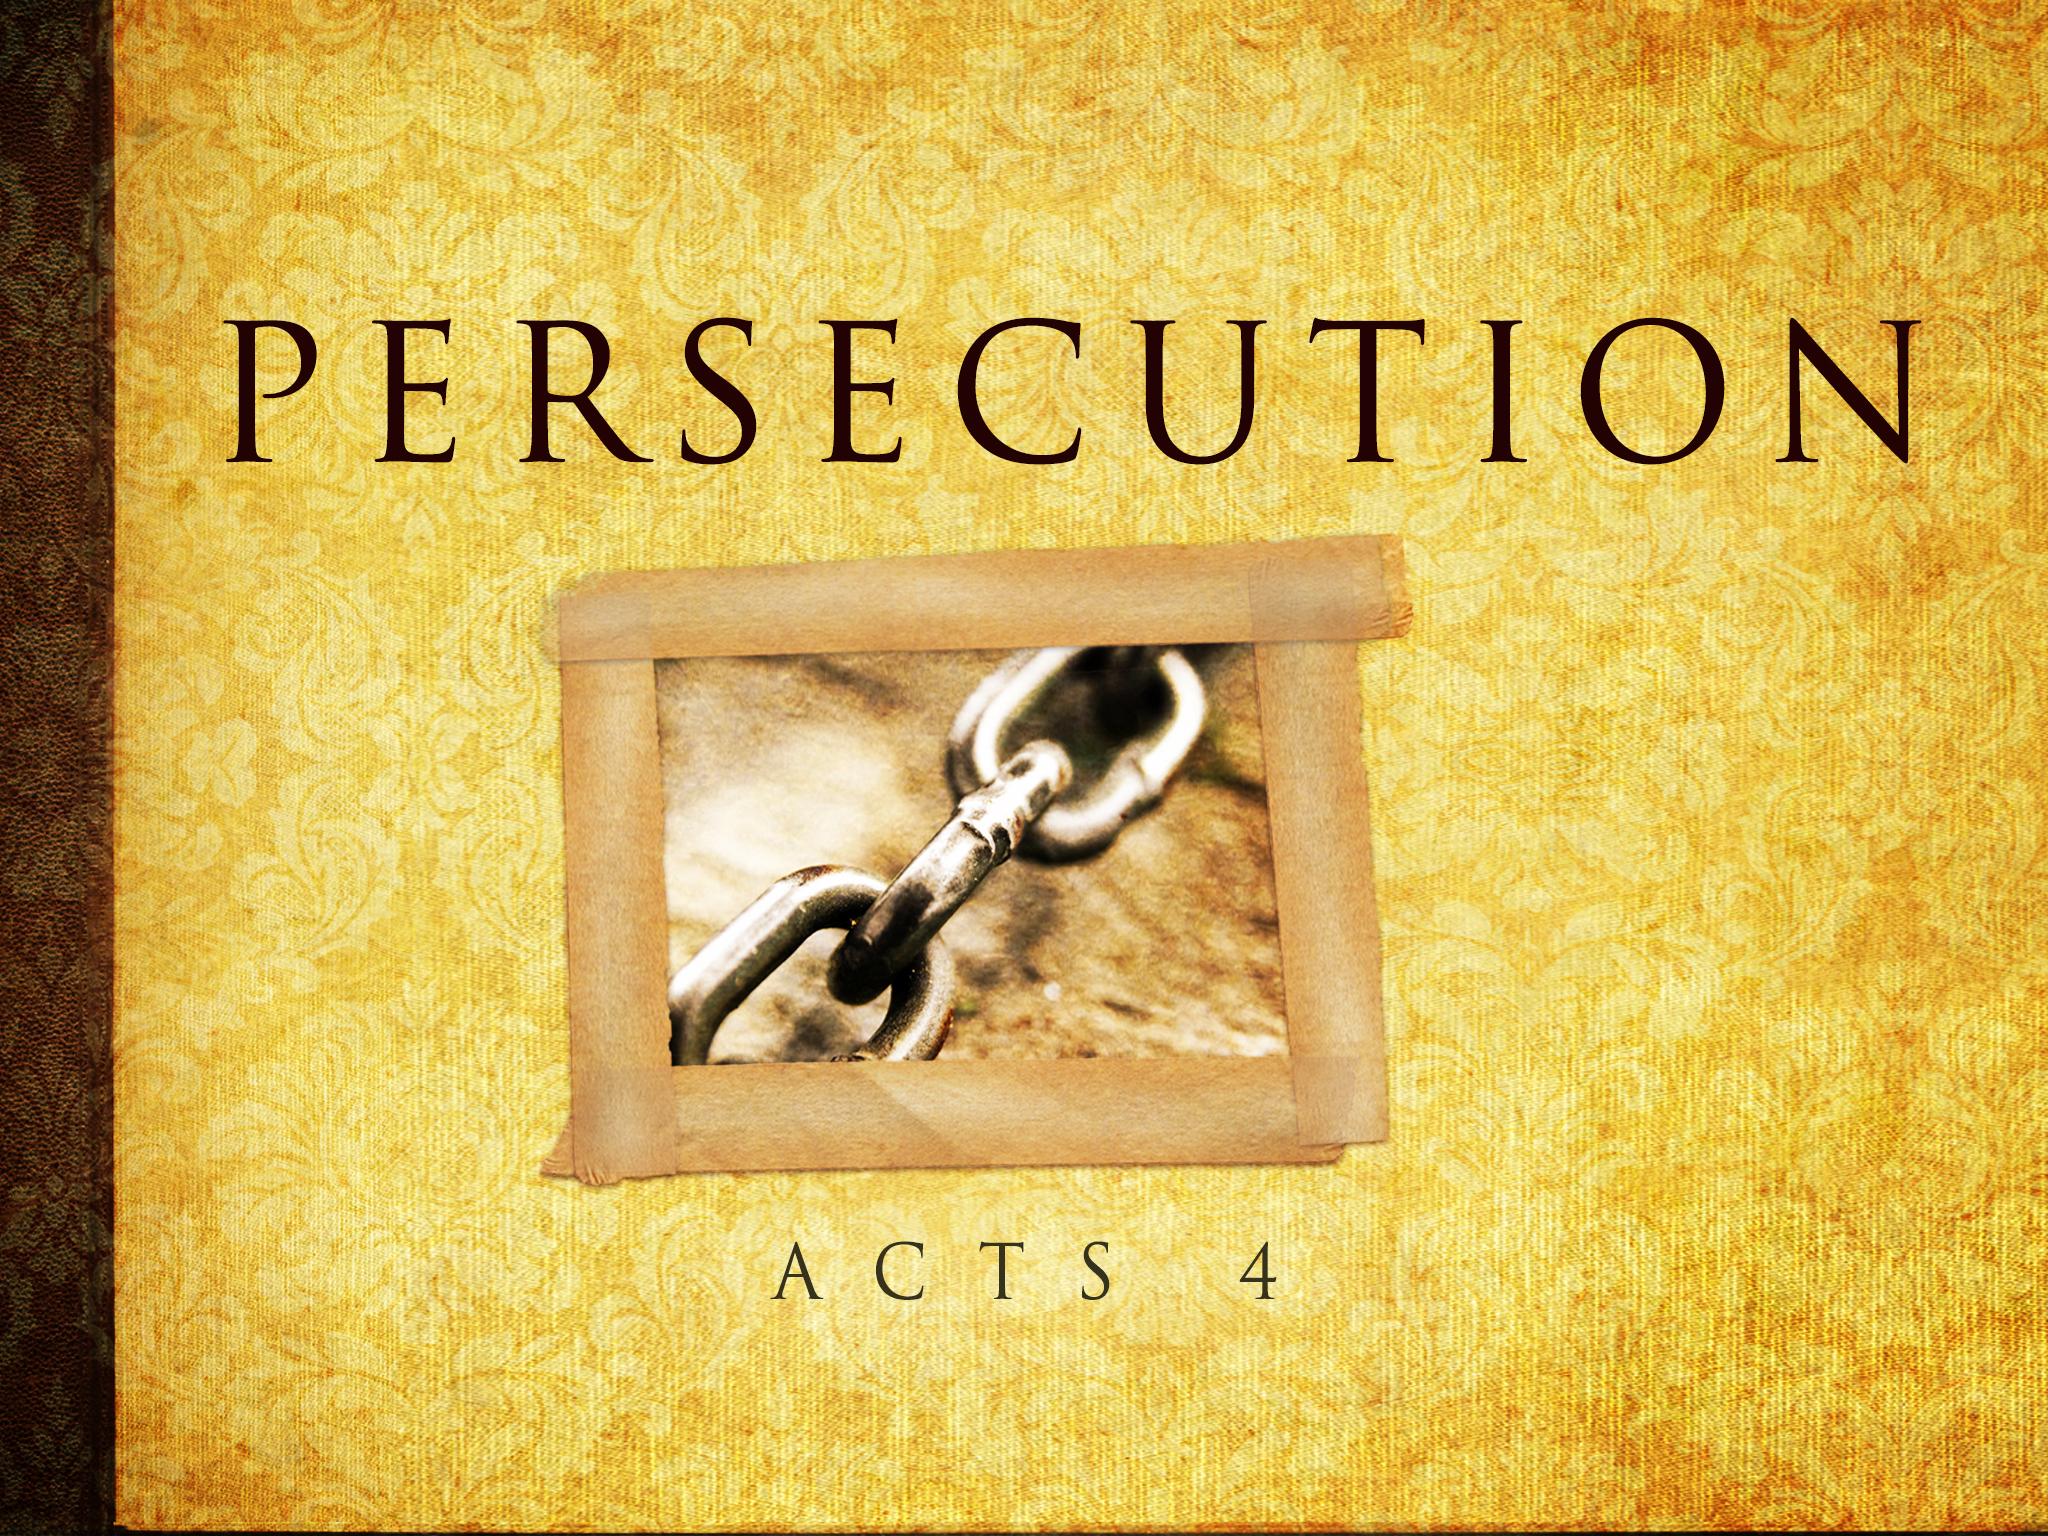 Persecution-4x3.jpg